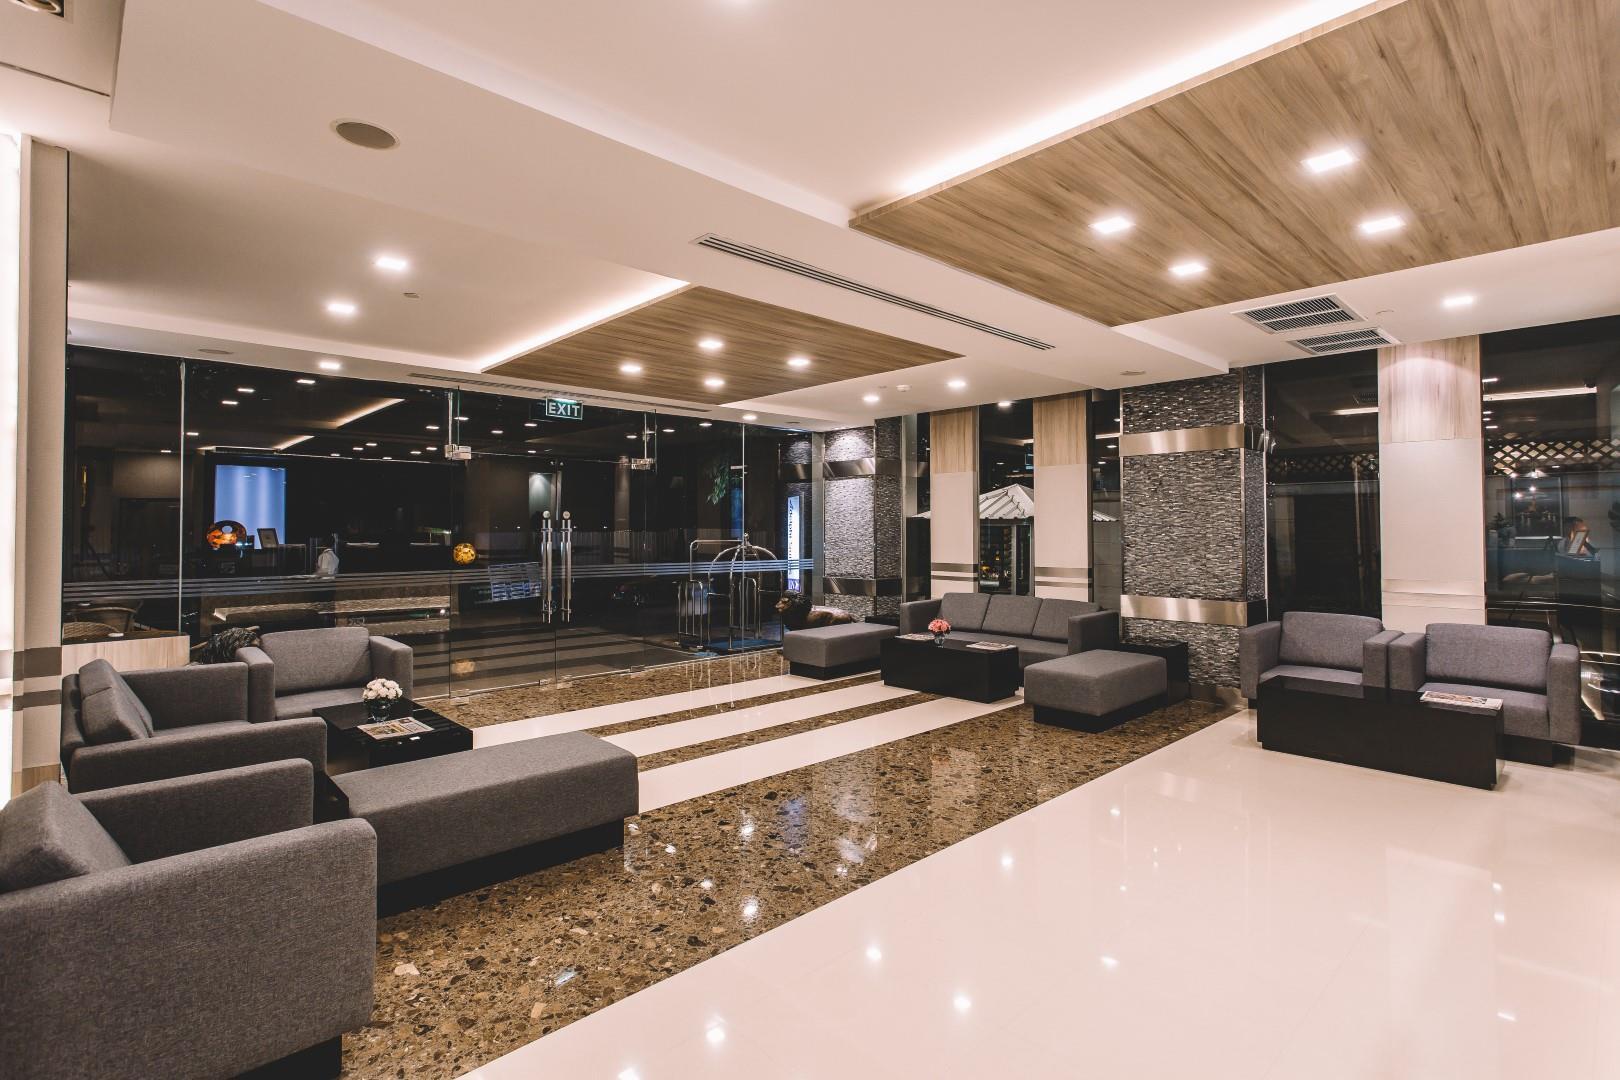 هتل رامادا پلازا بانکوک منام ریورساید